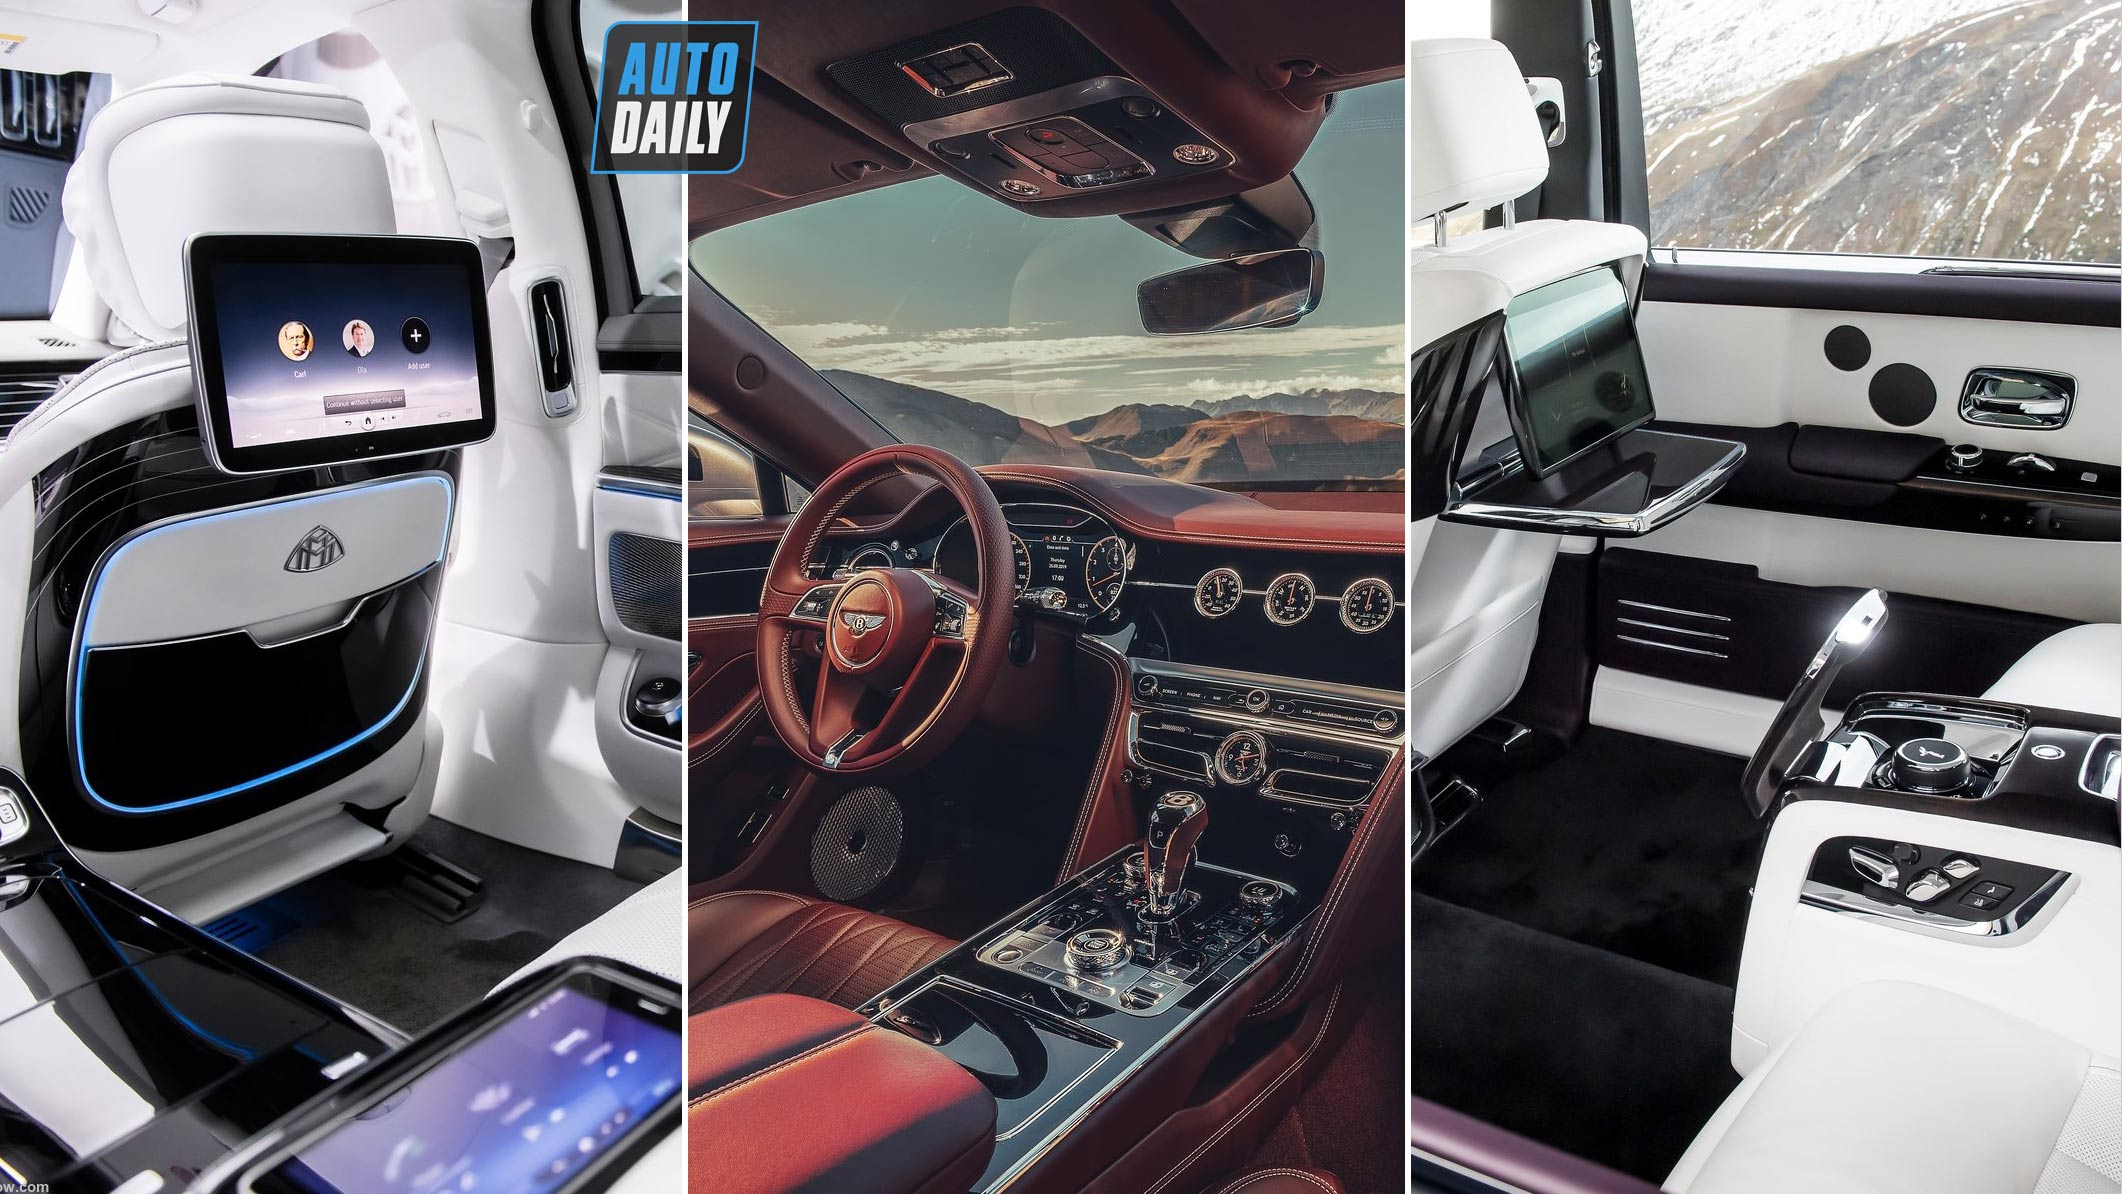 2021 Bentley Flying Spur Vs 2021 Maybach S class Vs New Rolls Royce Phantom INTERIOR